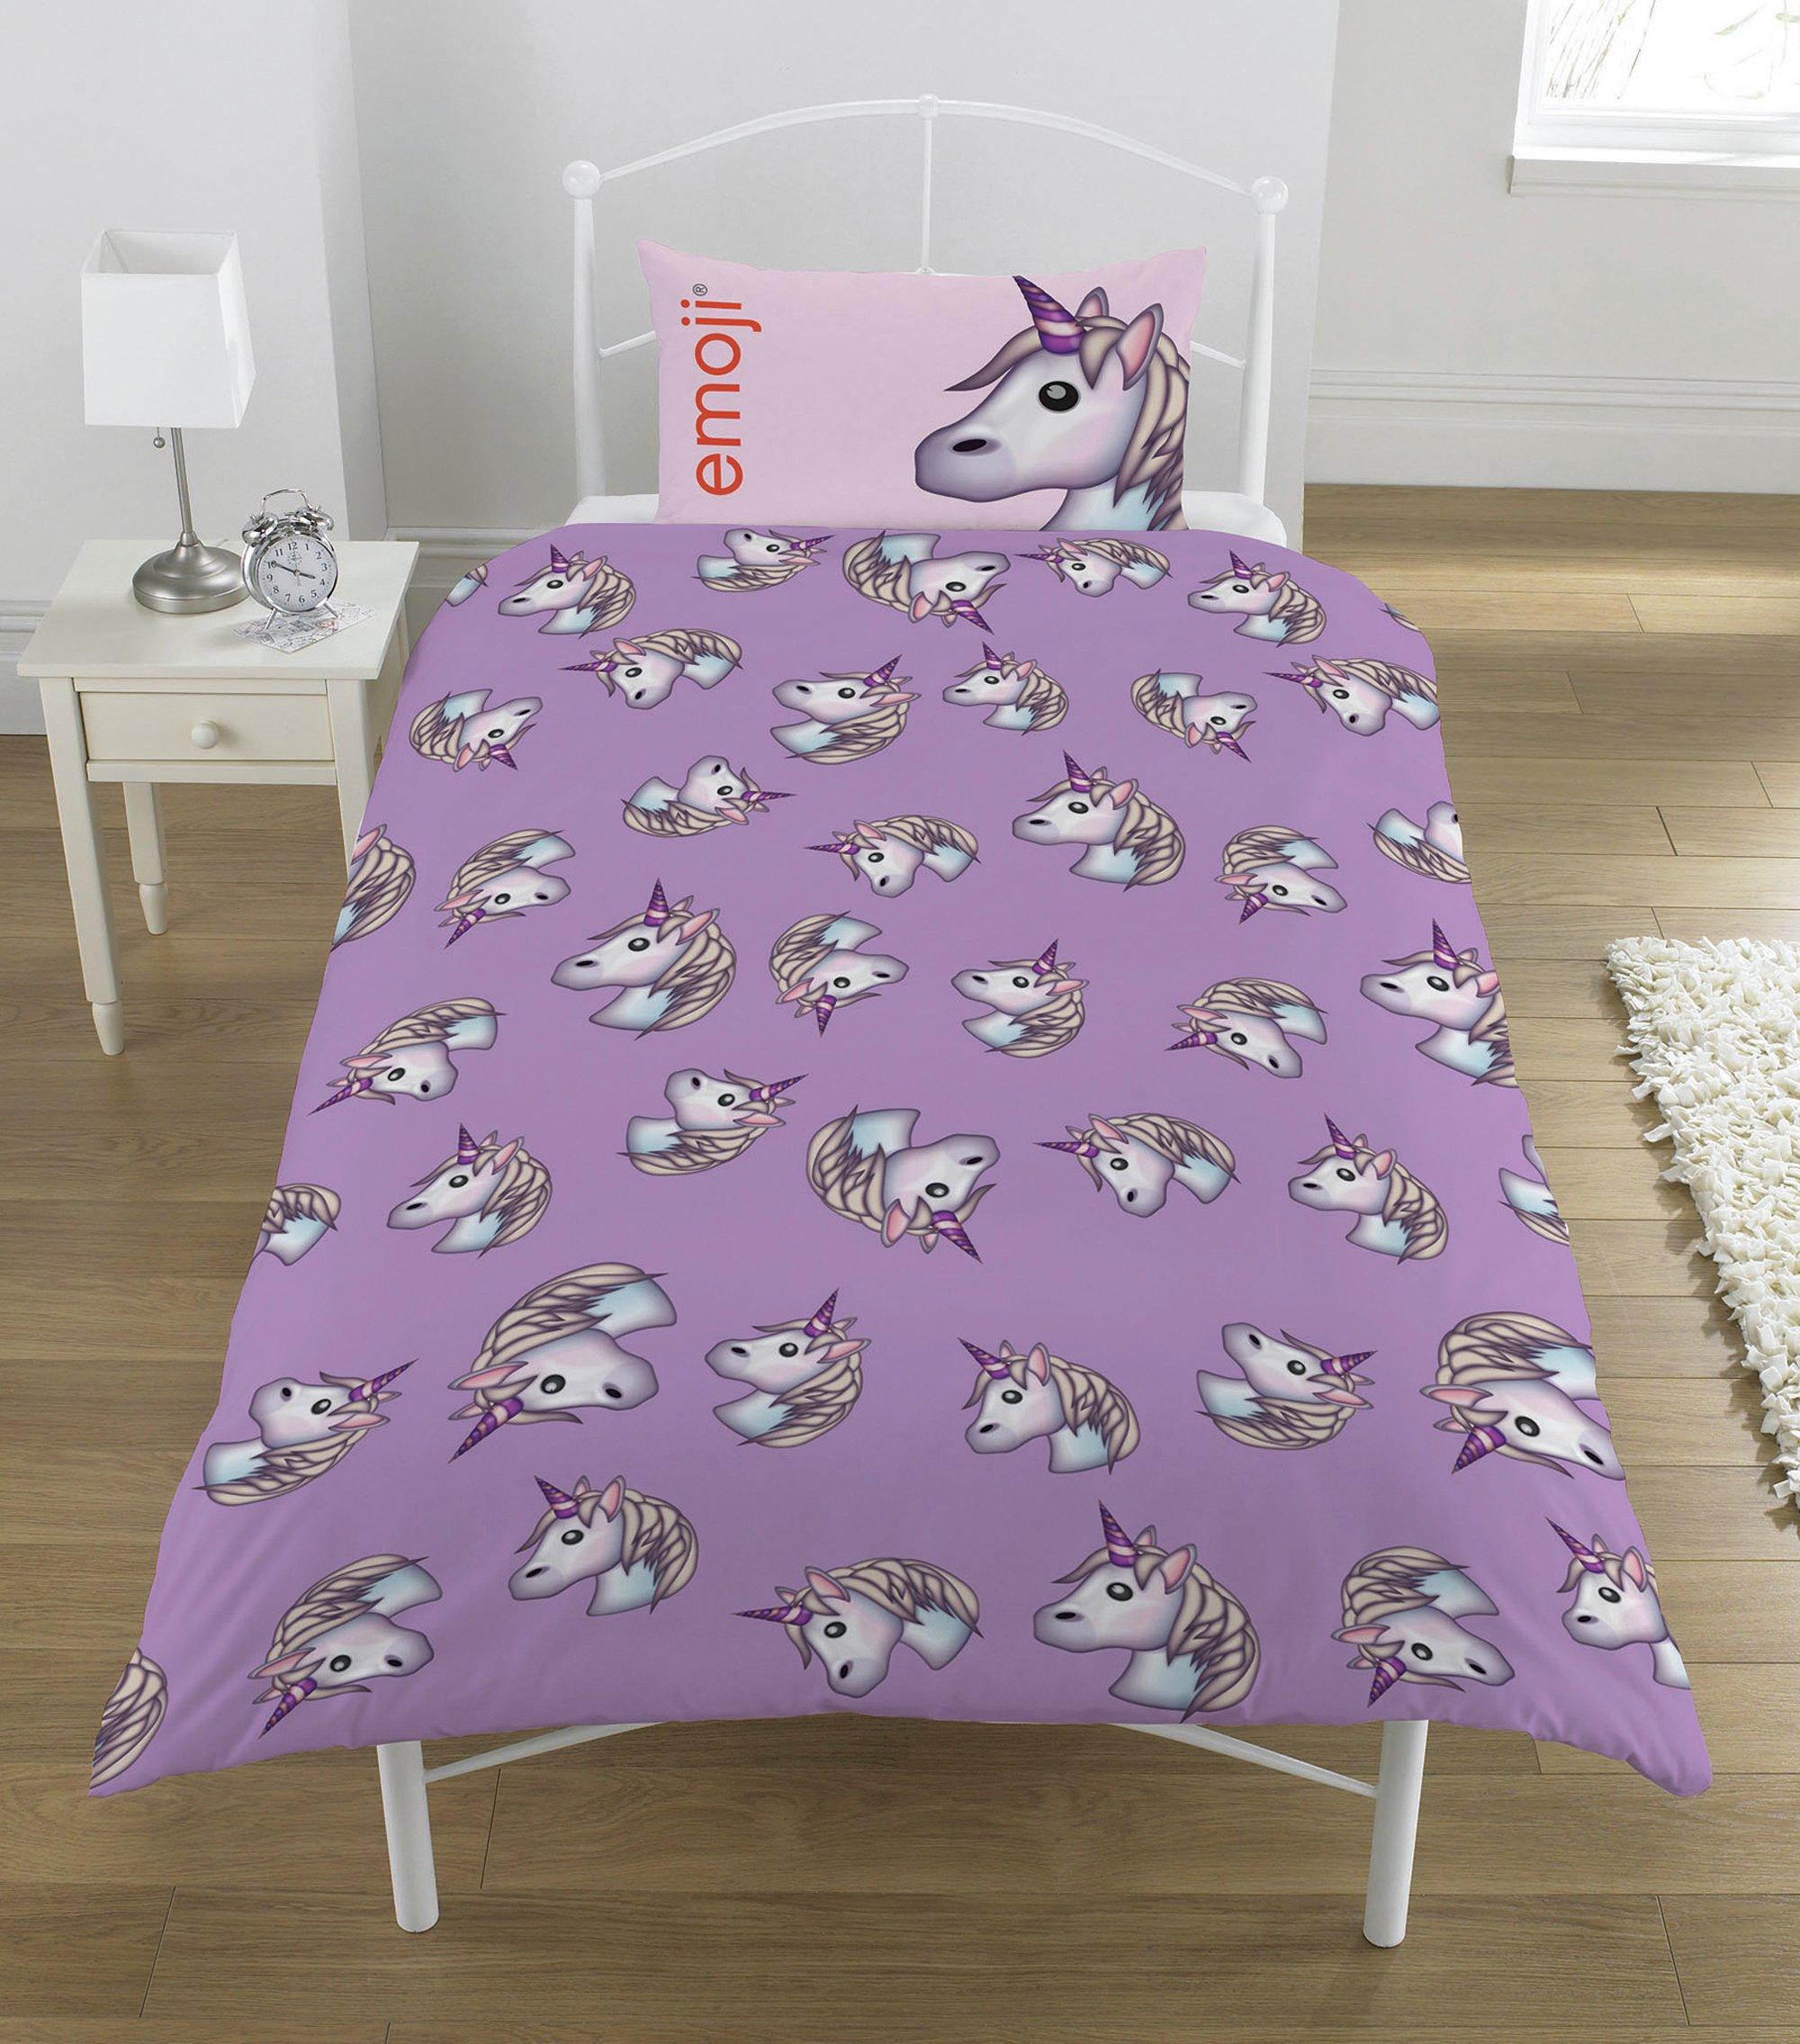 Emoji Unicorn Bedding Set - Single.